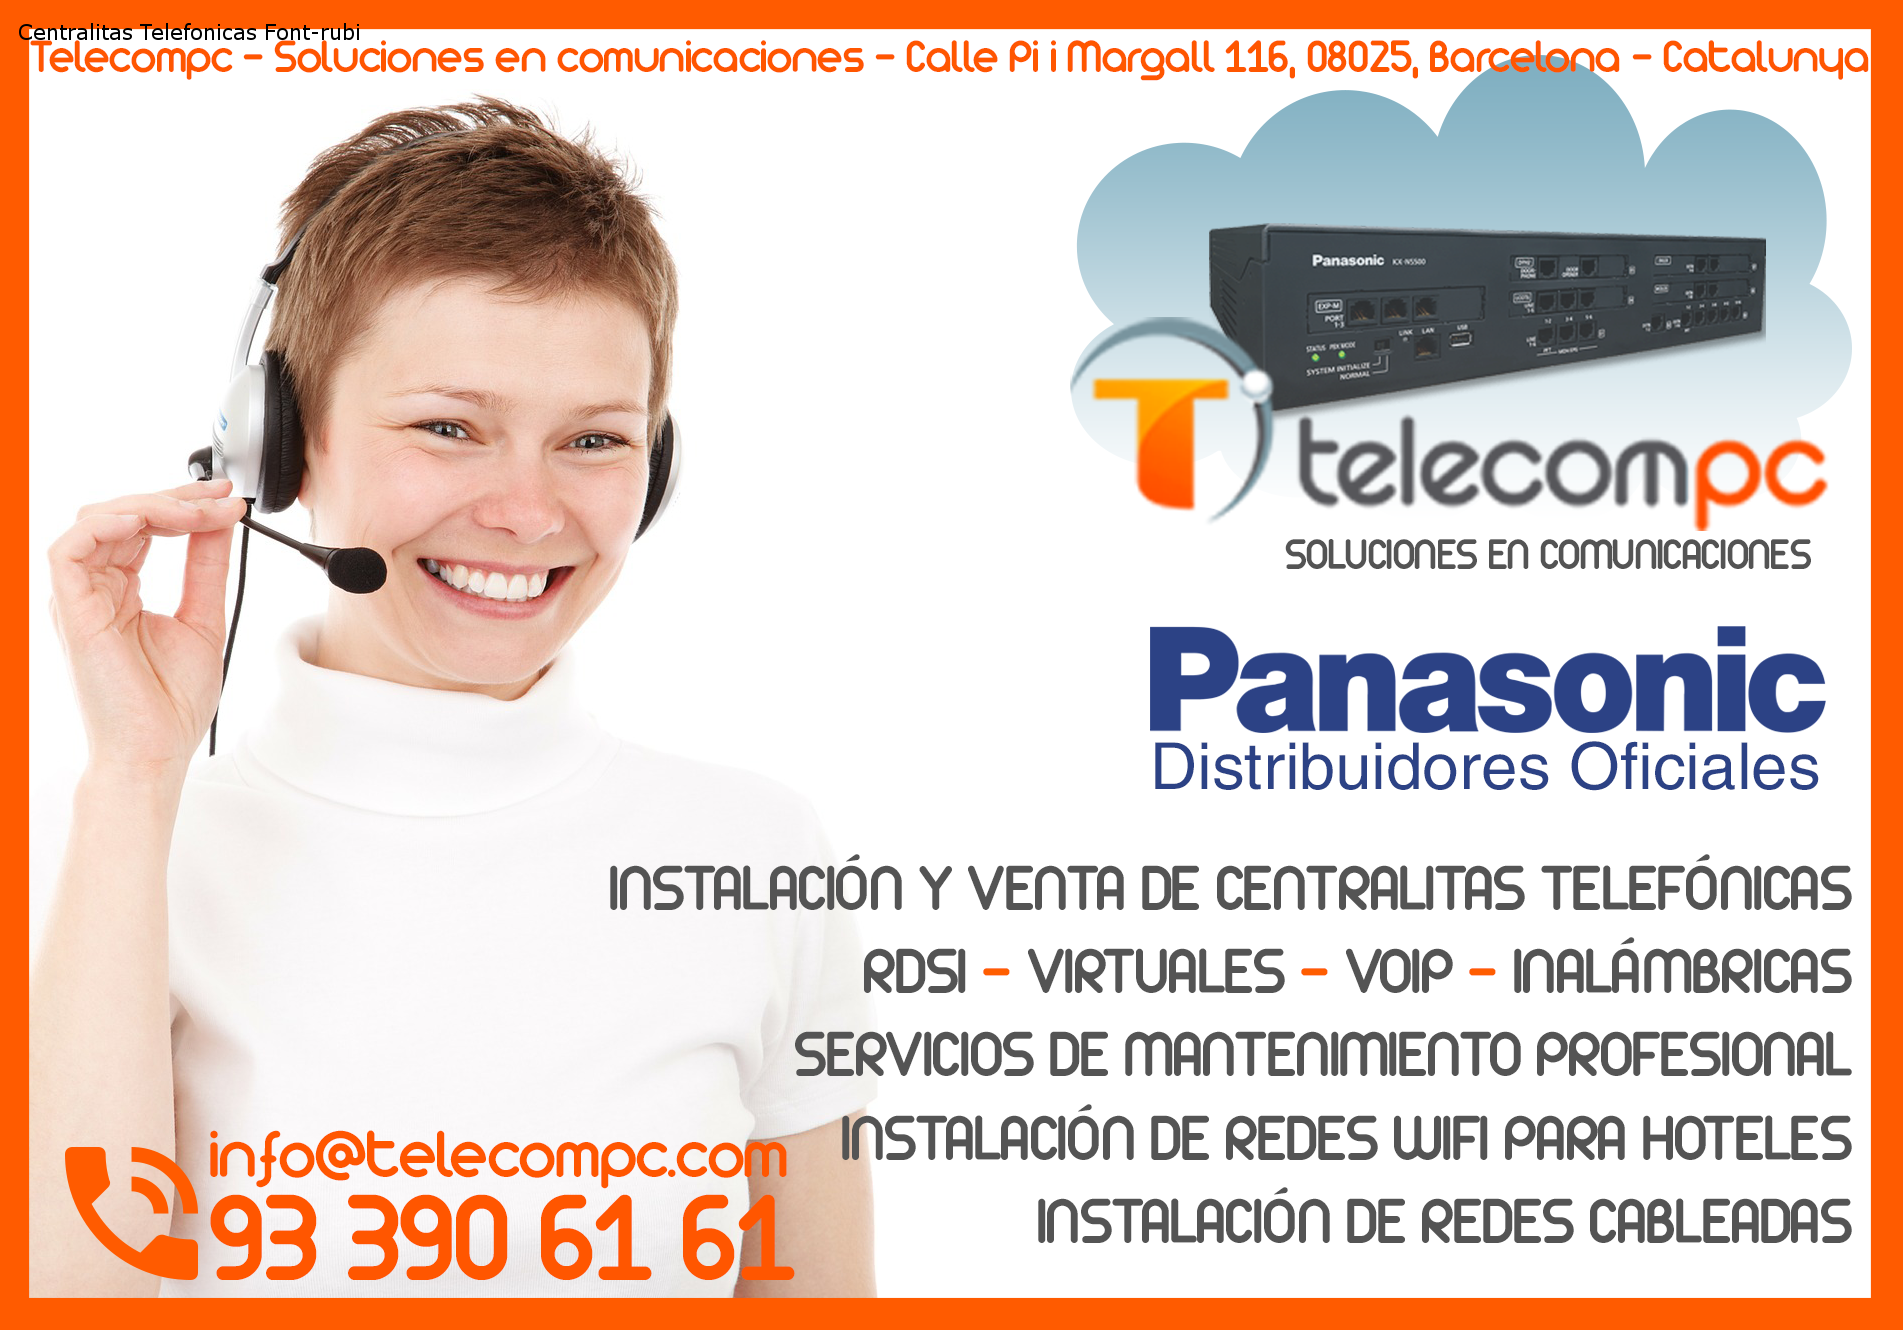 Centralitas Telefonicas Font-rubi